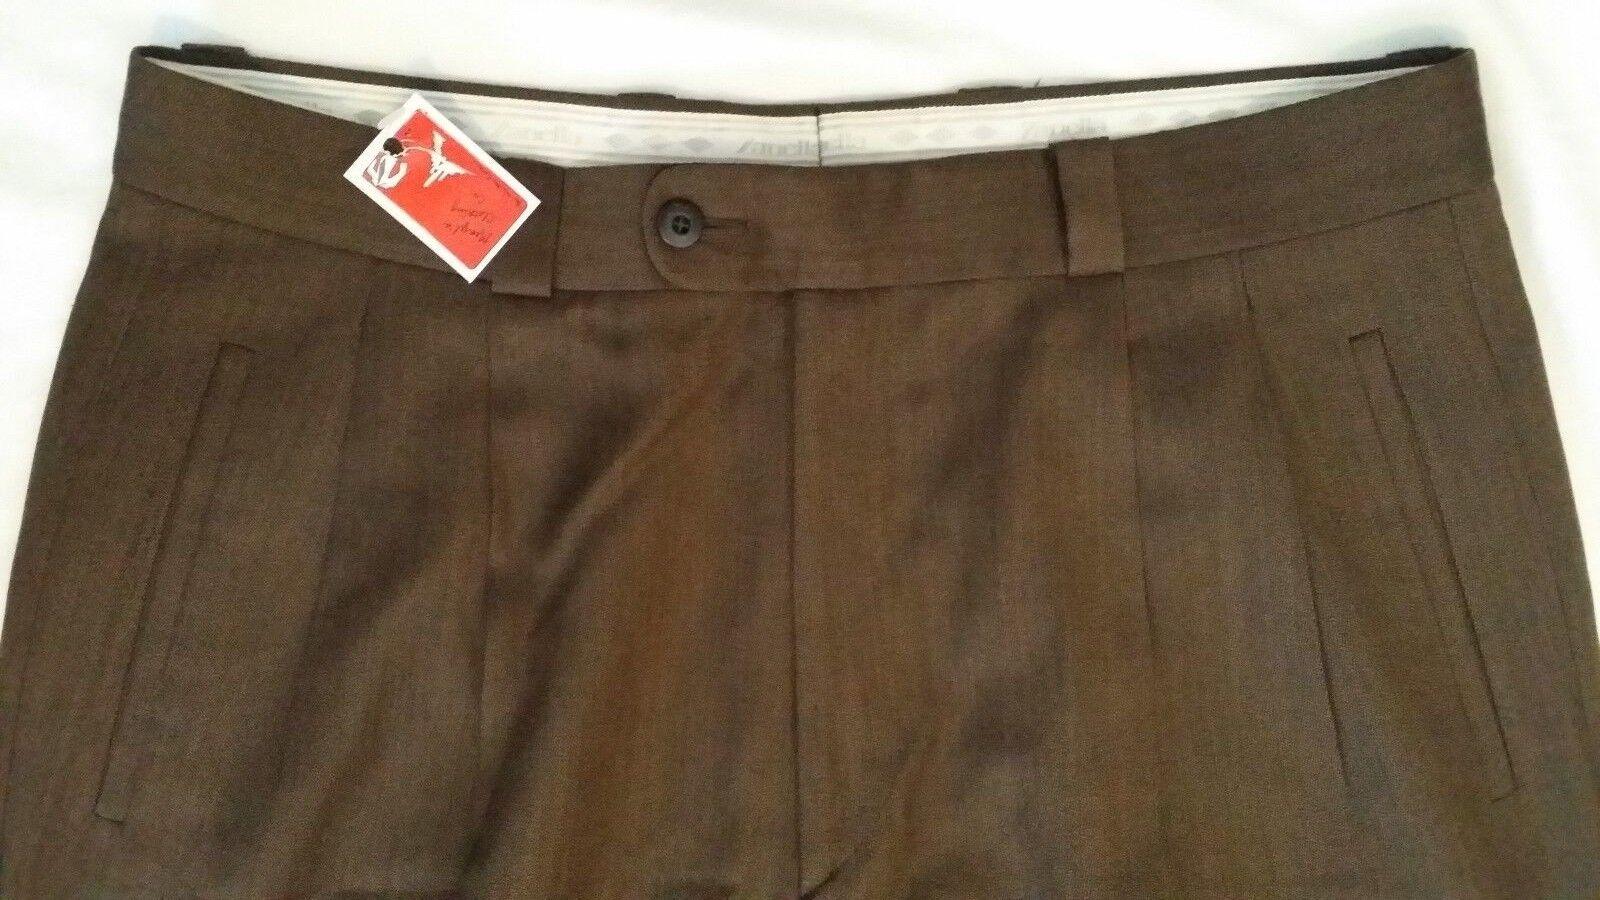 Zanella 100% Wool Brown Pleat Front Dress Pants Men's Size 33 x 32.5 DAVIS